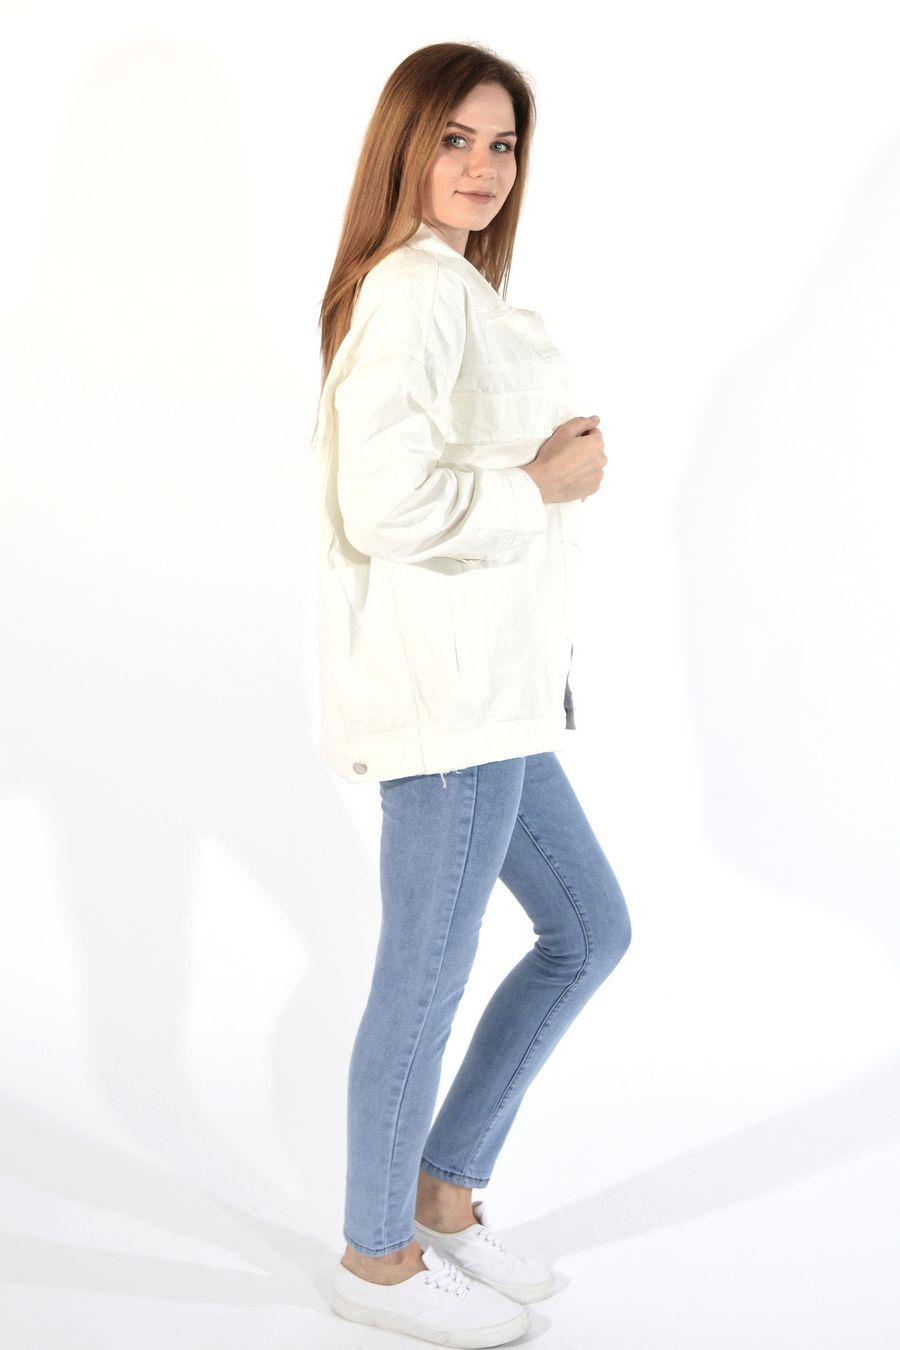 Жакет женский (джинсовка) LRZBS 955 - фото 6